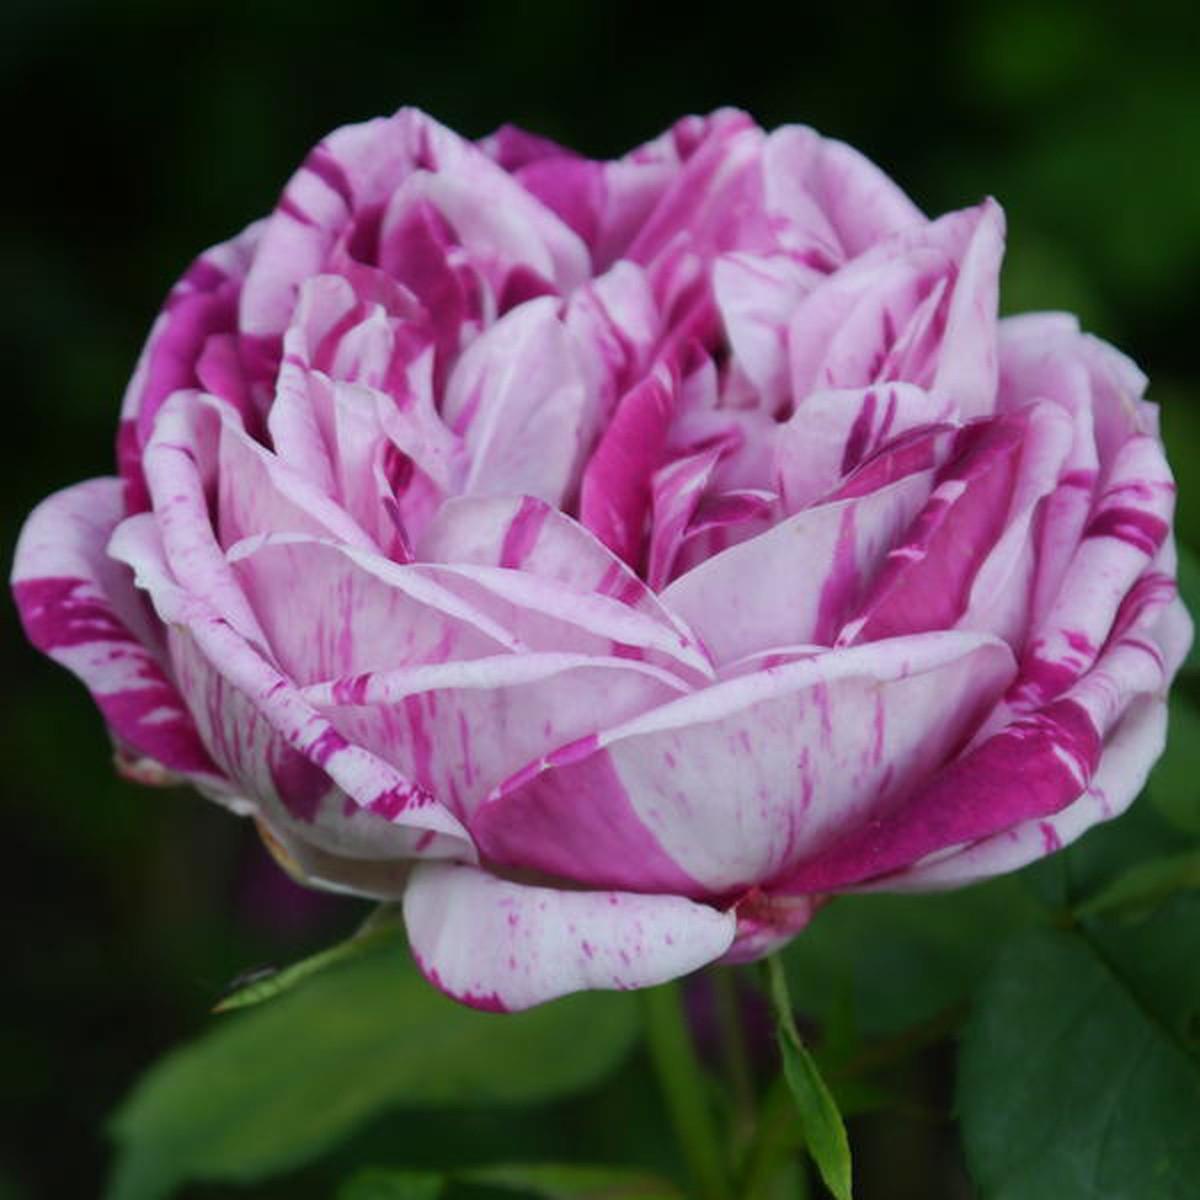 Rosa honorine de brabant 2